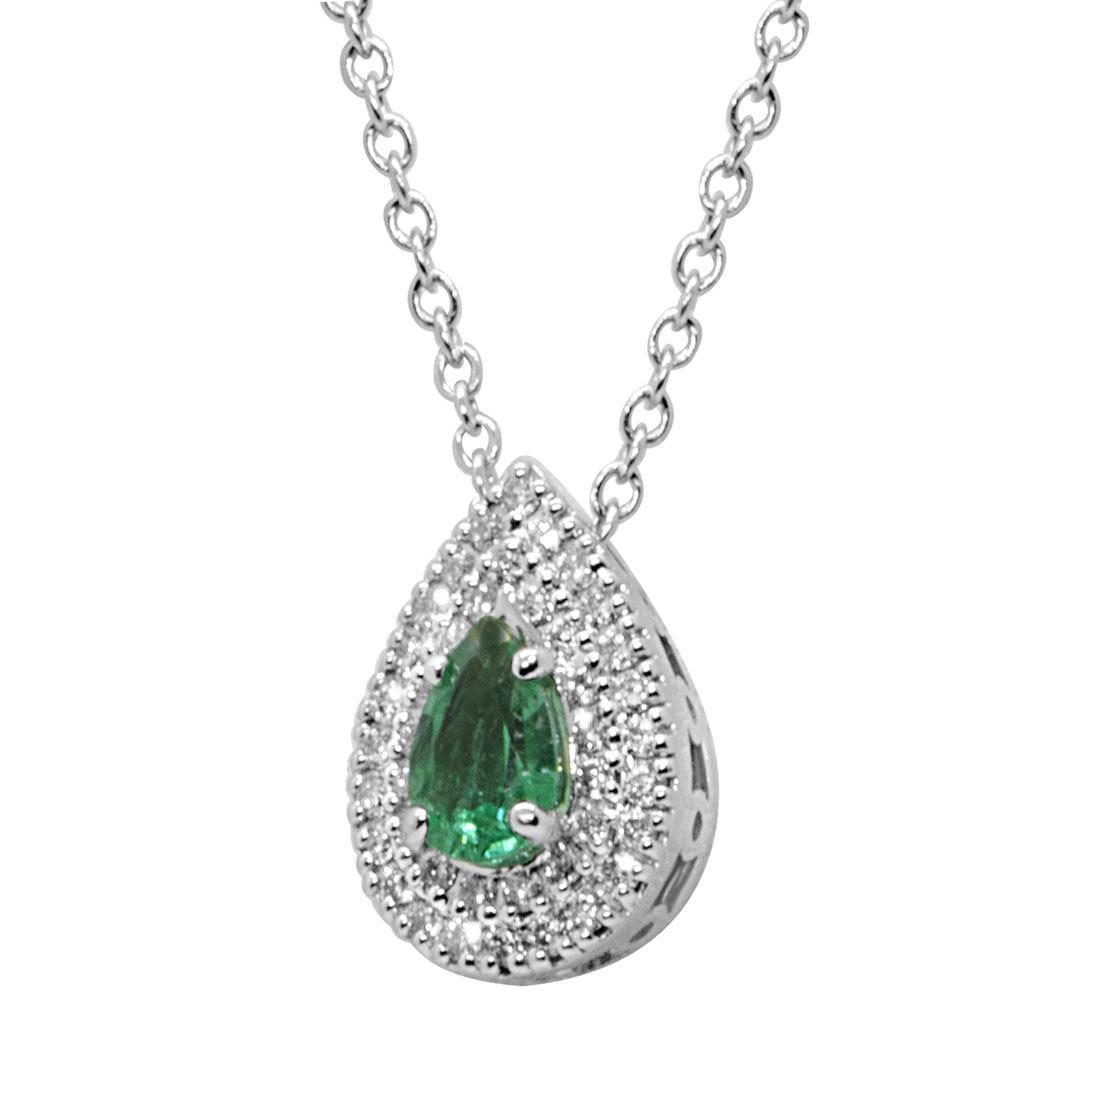 Collana Alfieri & St john con diamanti e smeraldo - ALFIERI ST JOHN